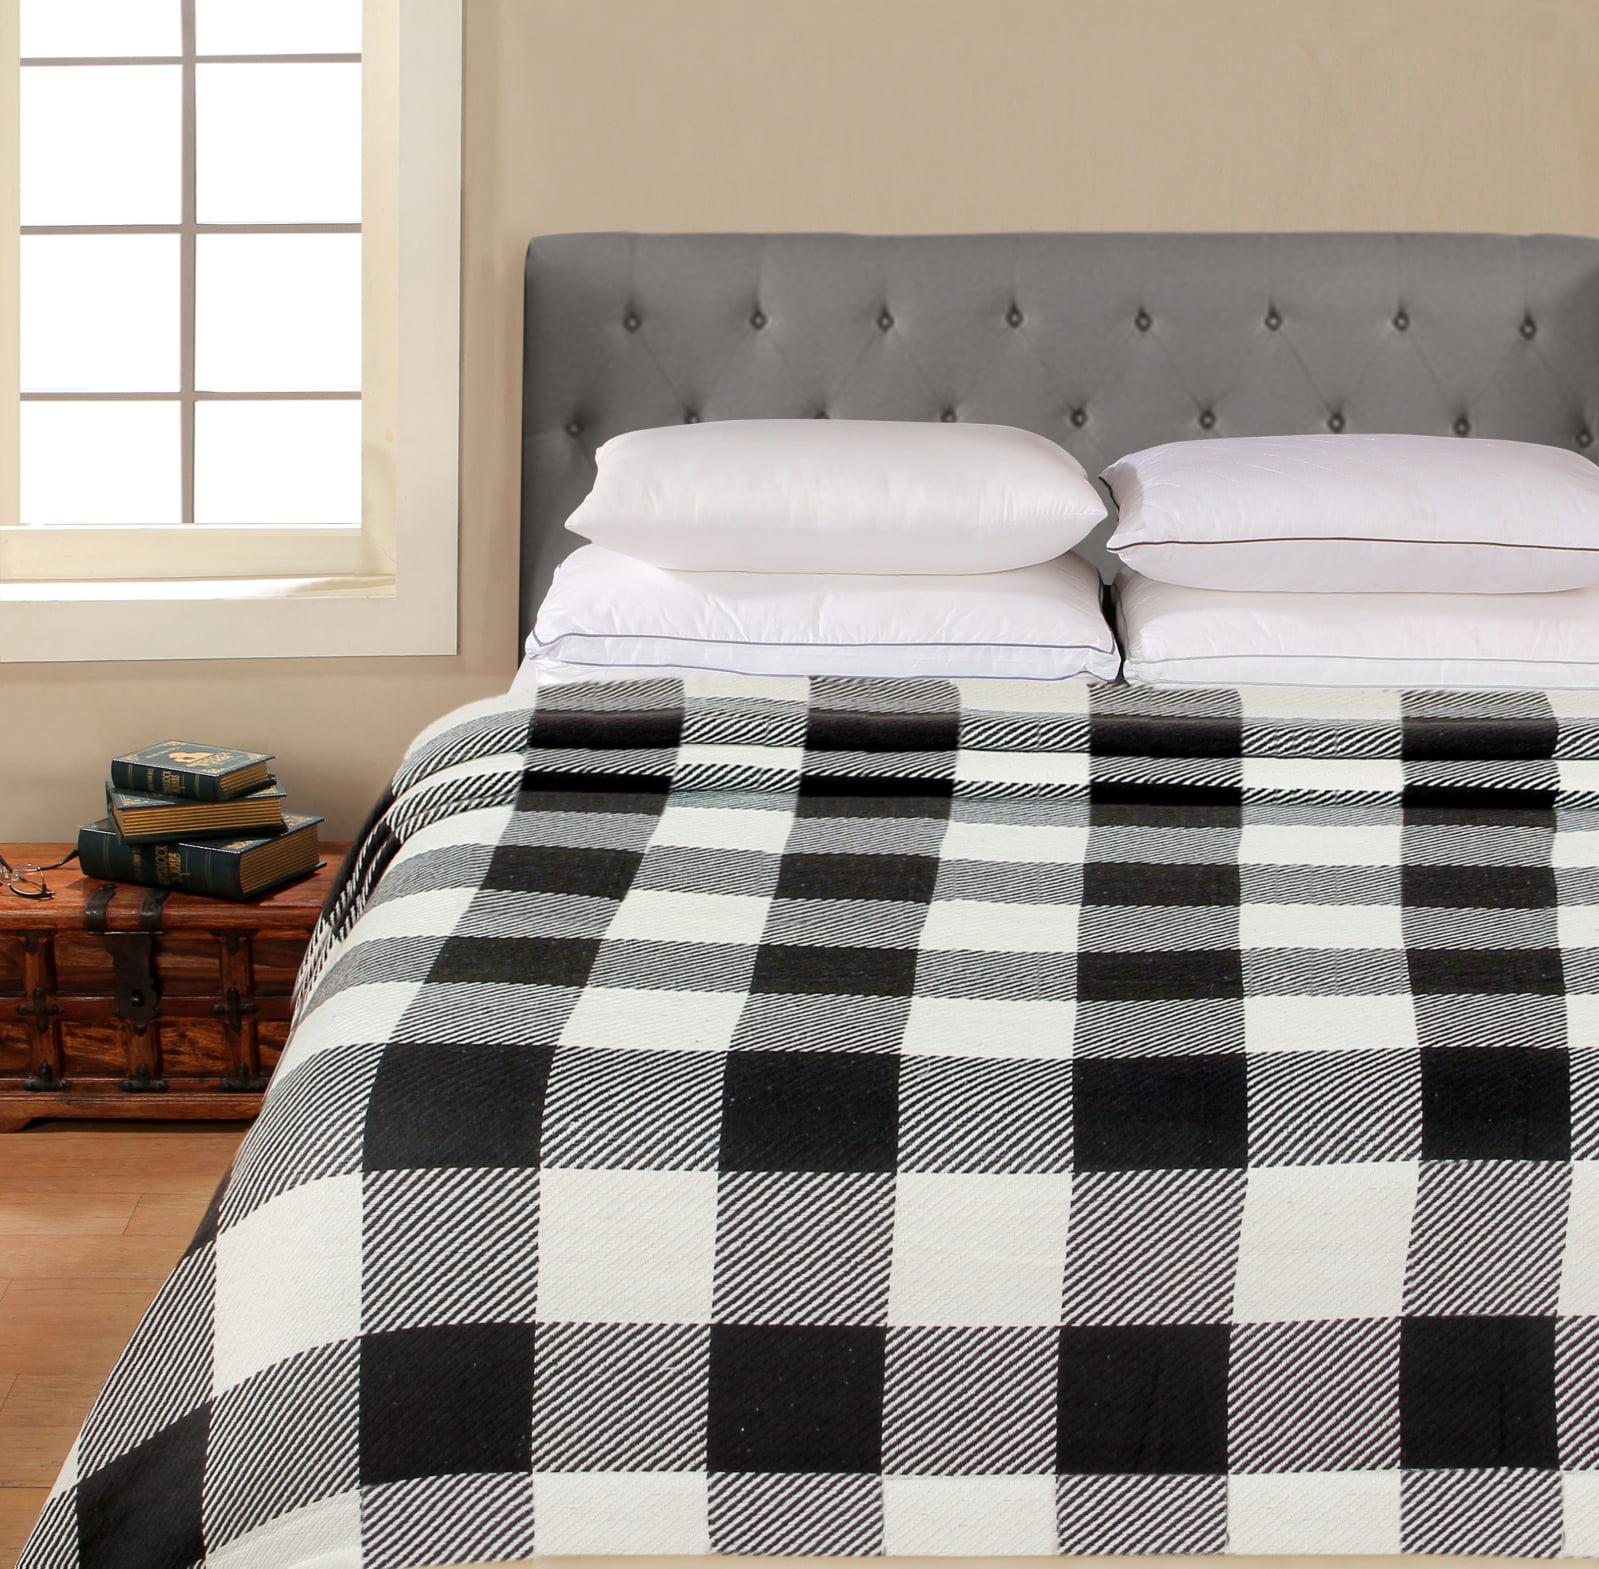 Better Homes & Gardens 100% Cotton Blanket - Classic Buffalo Blanket Grey